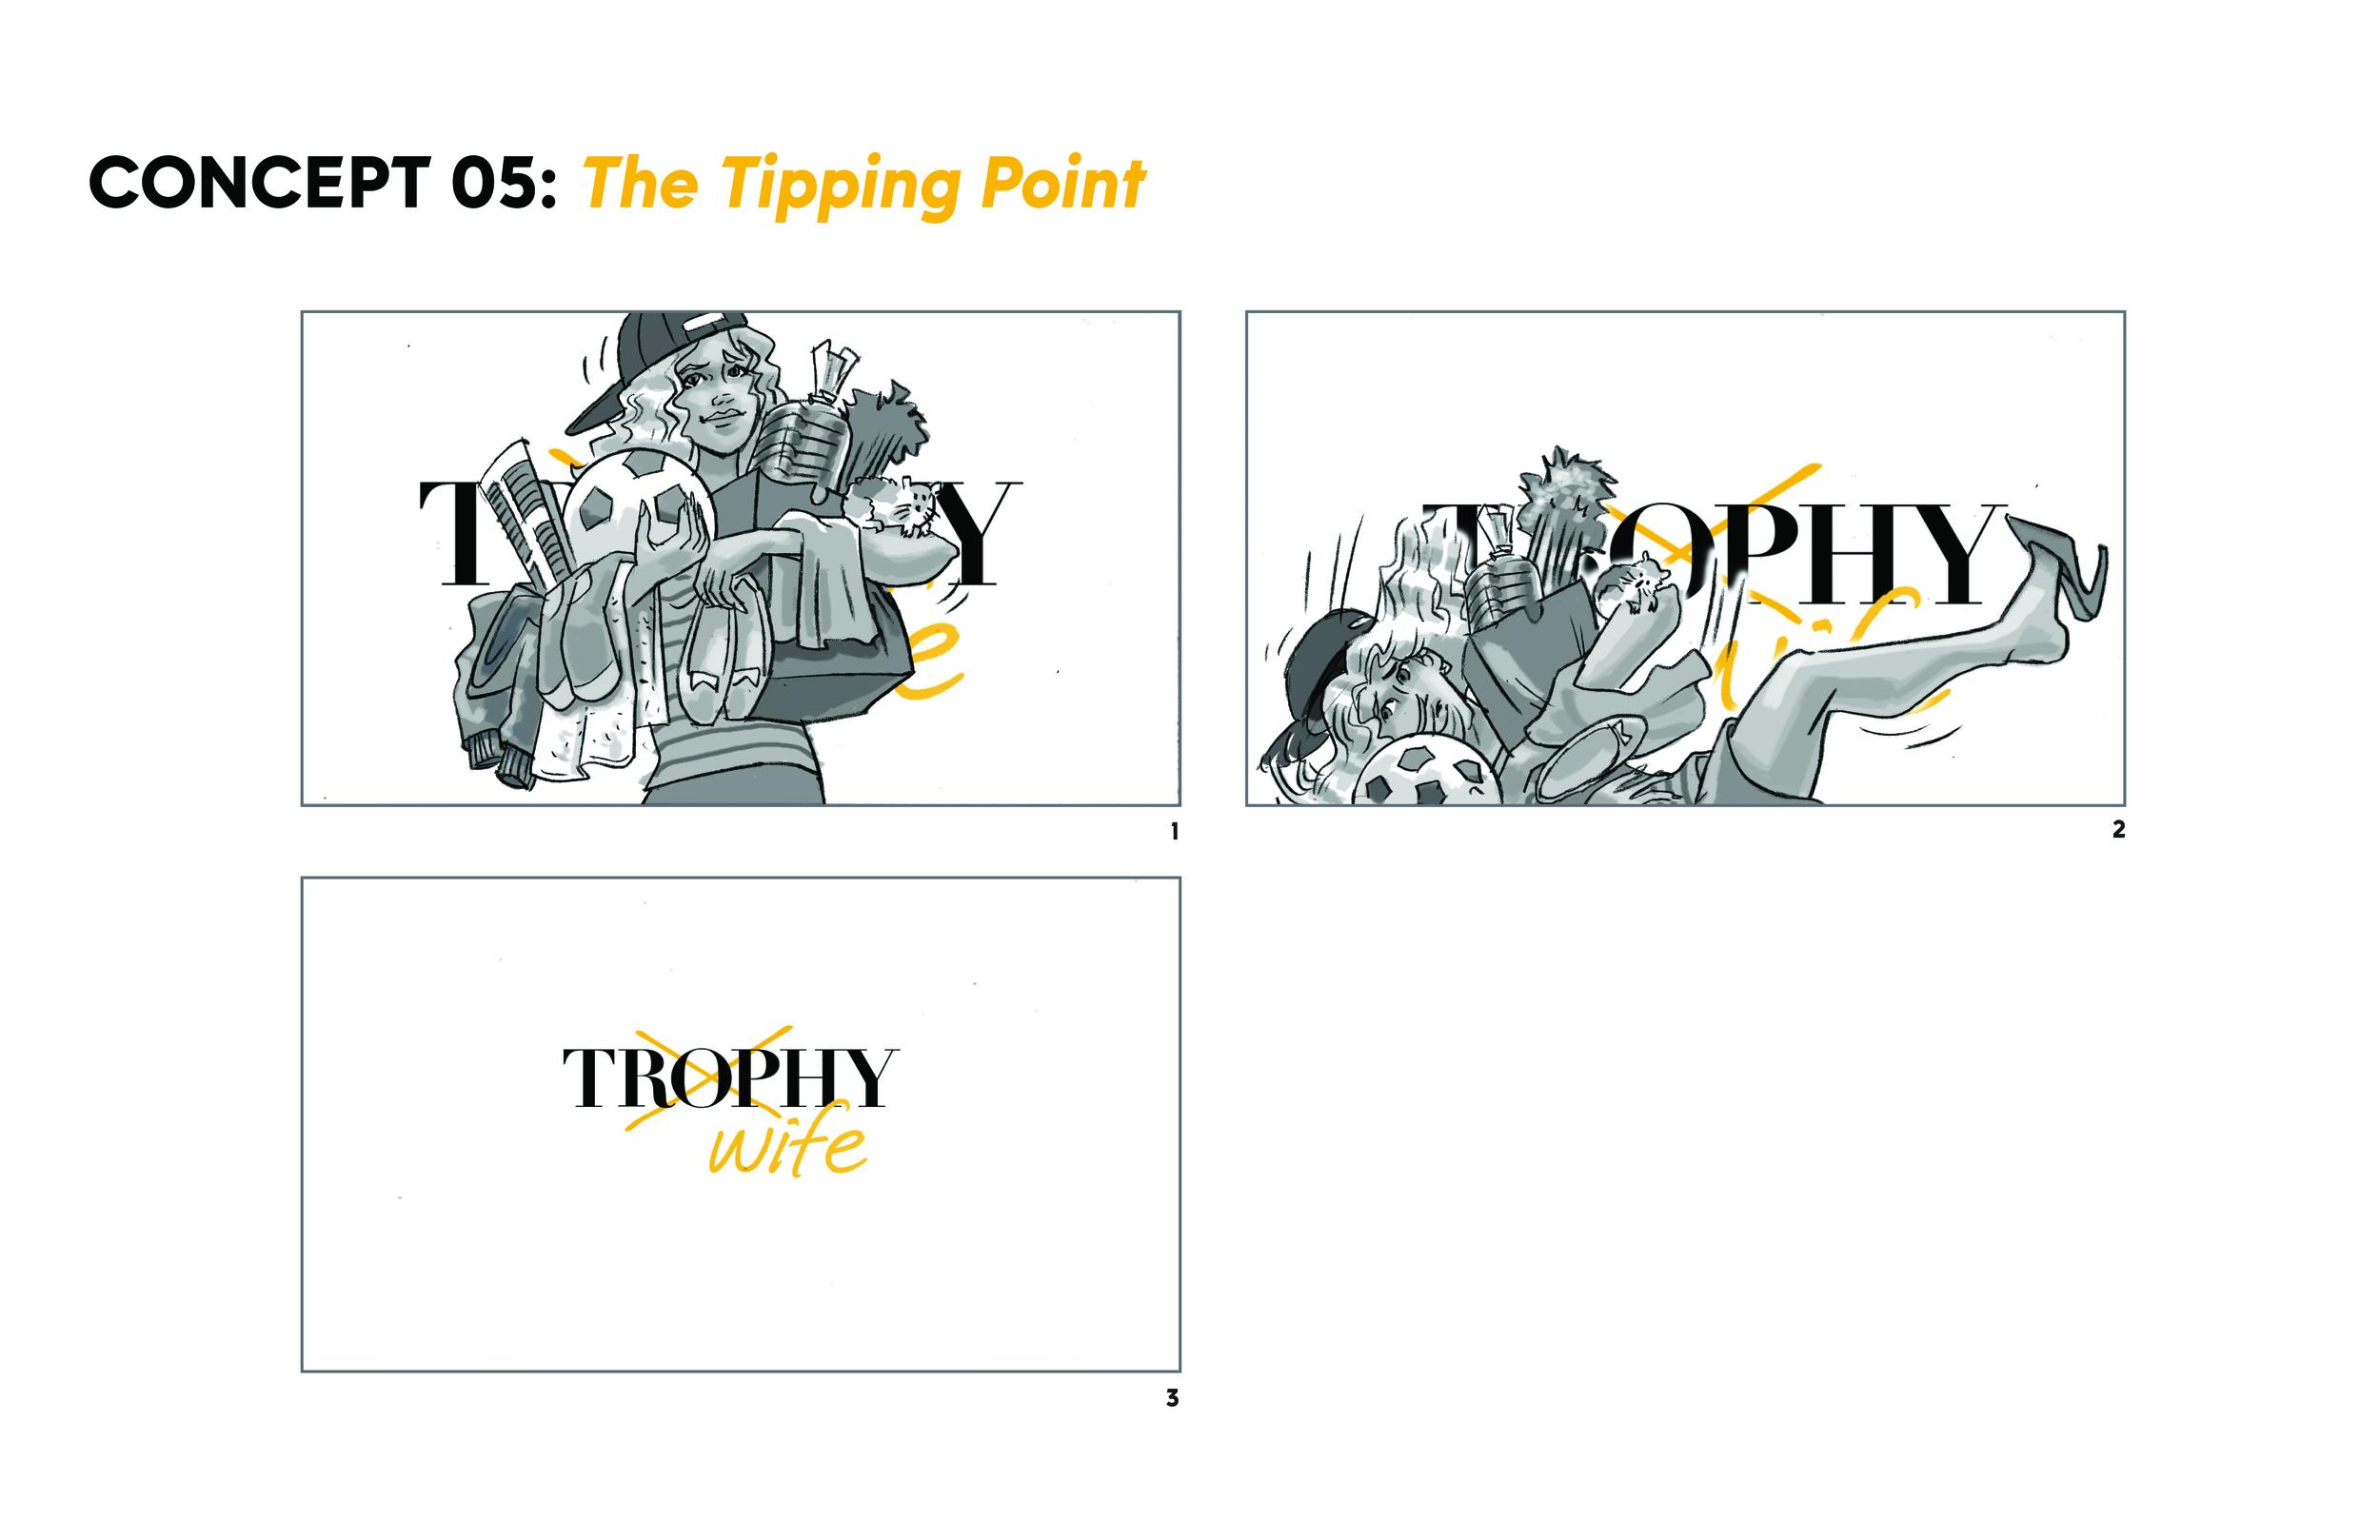 trophywife_concepts5.jpg